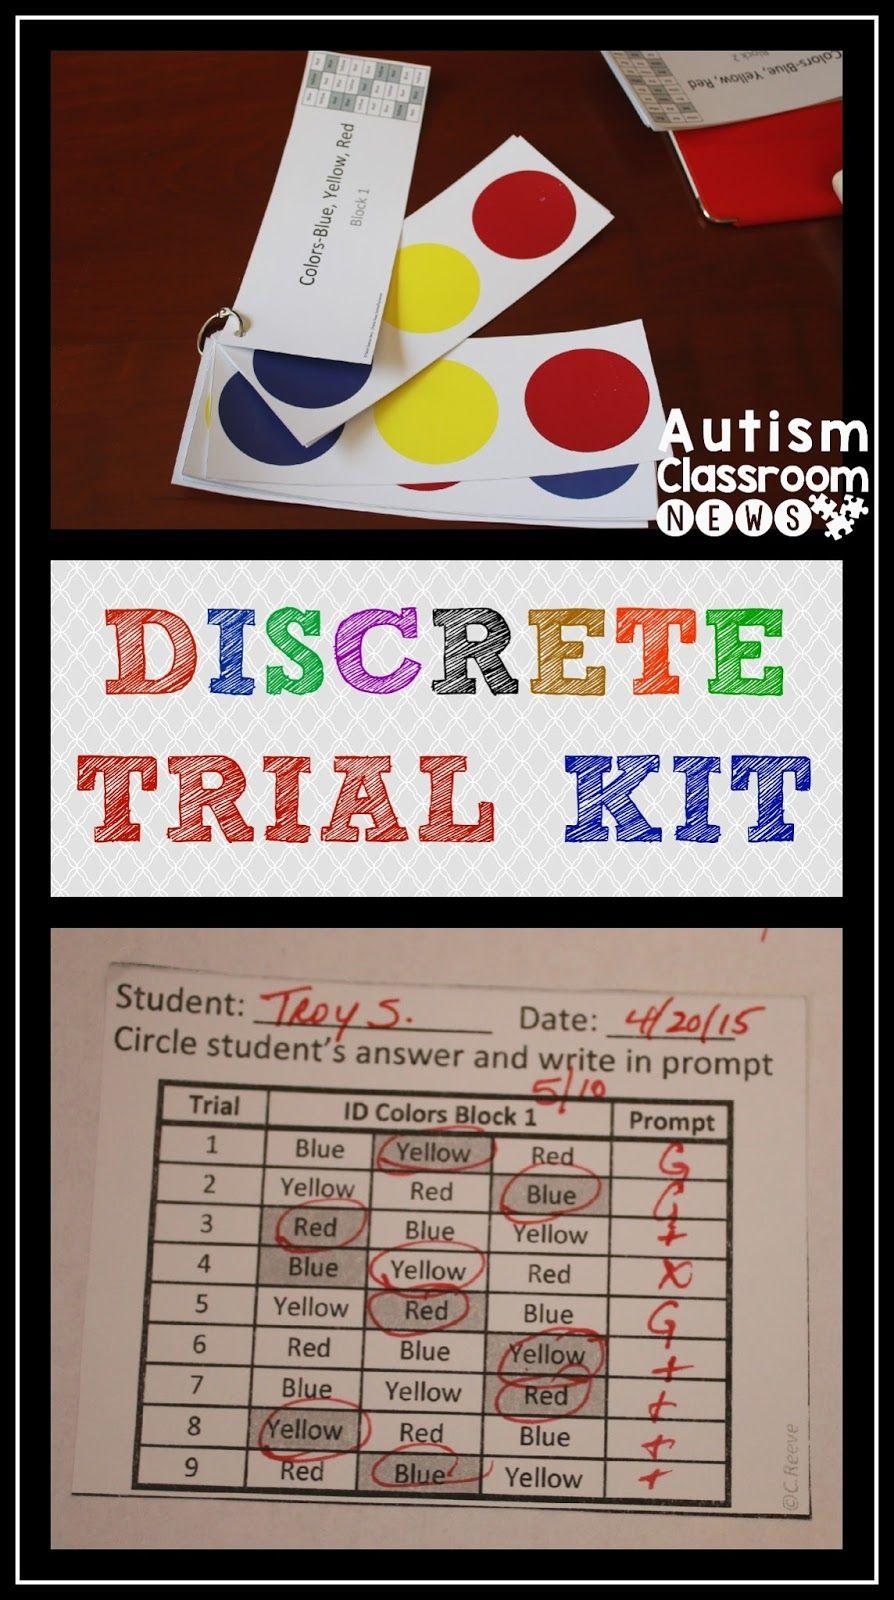 Discrete Trial Kit And A Free Sampler Discrete Trial Discrete Trial Training Autism Classroom